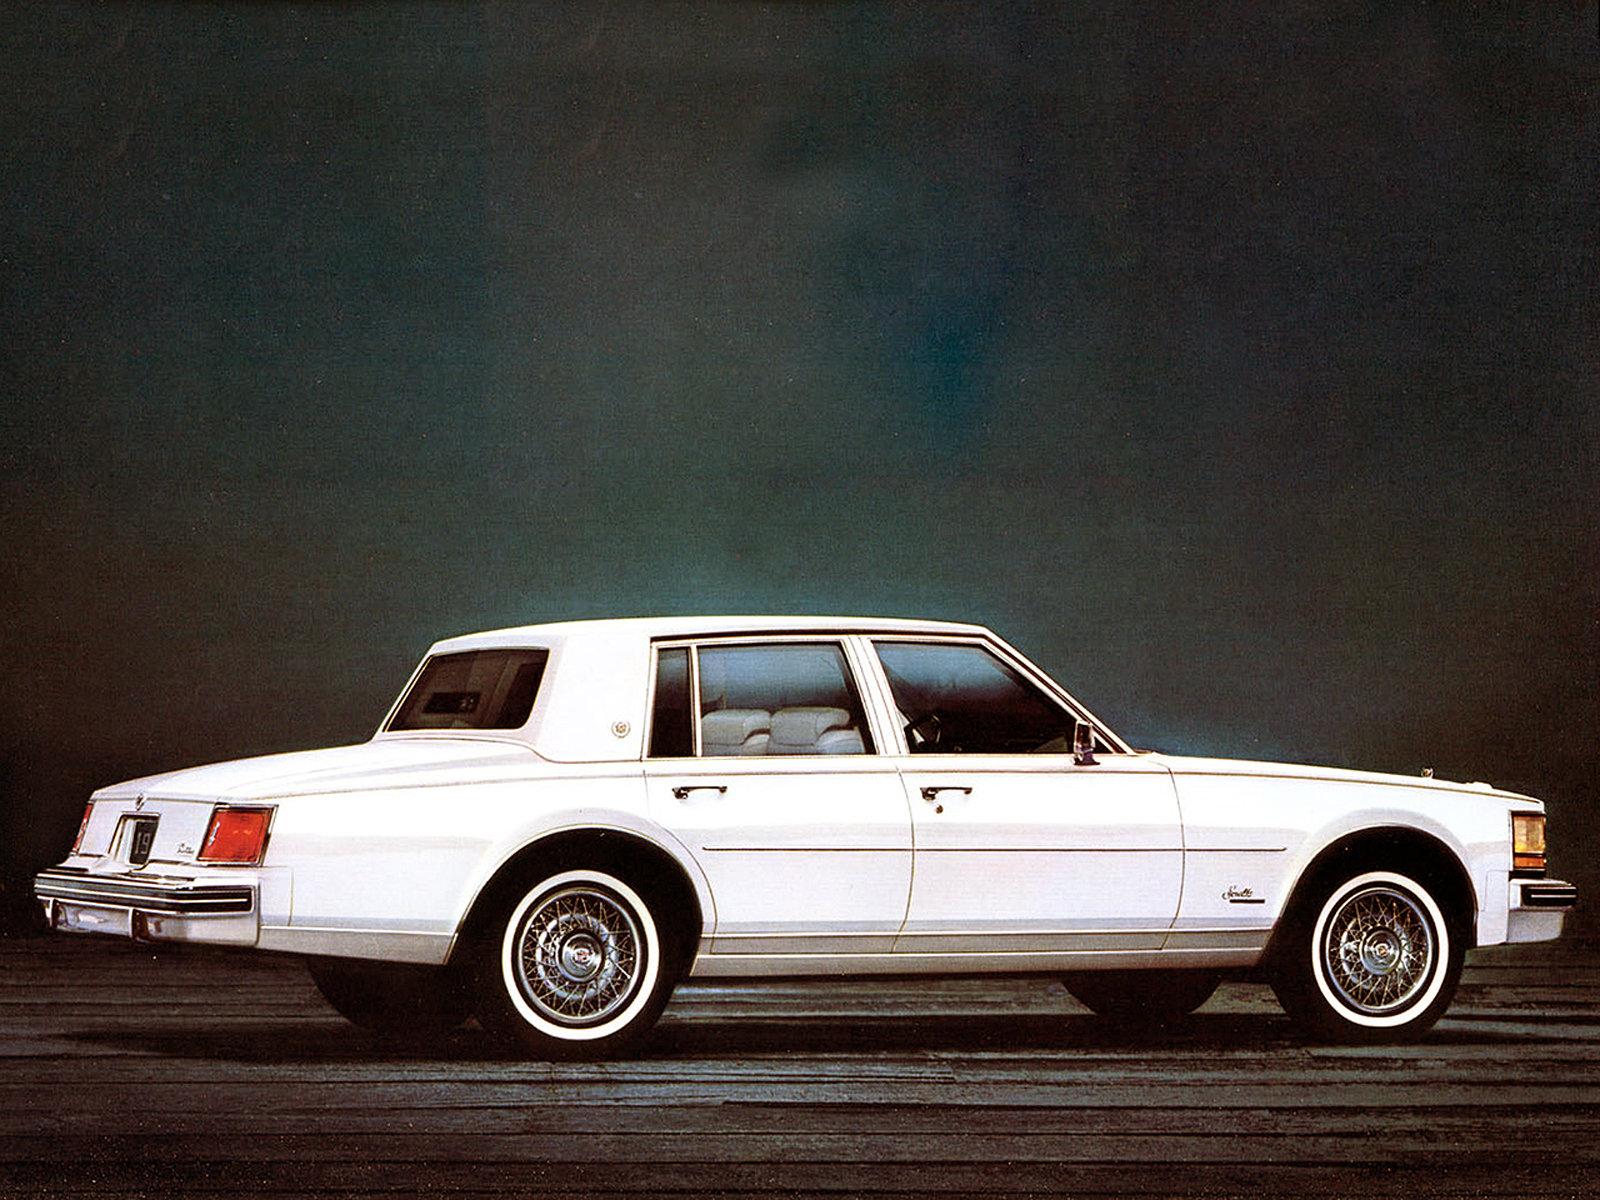 Cadillac_Seville_Sedan_1975.jpg